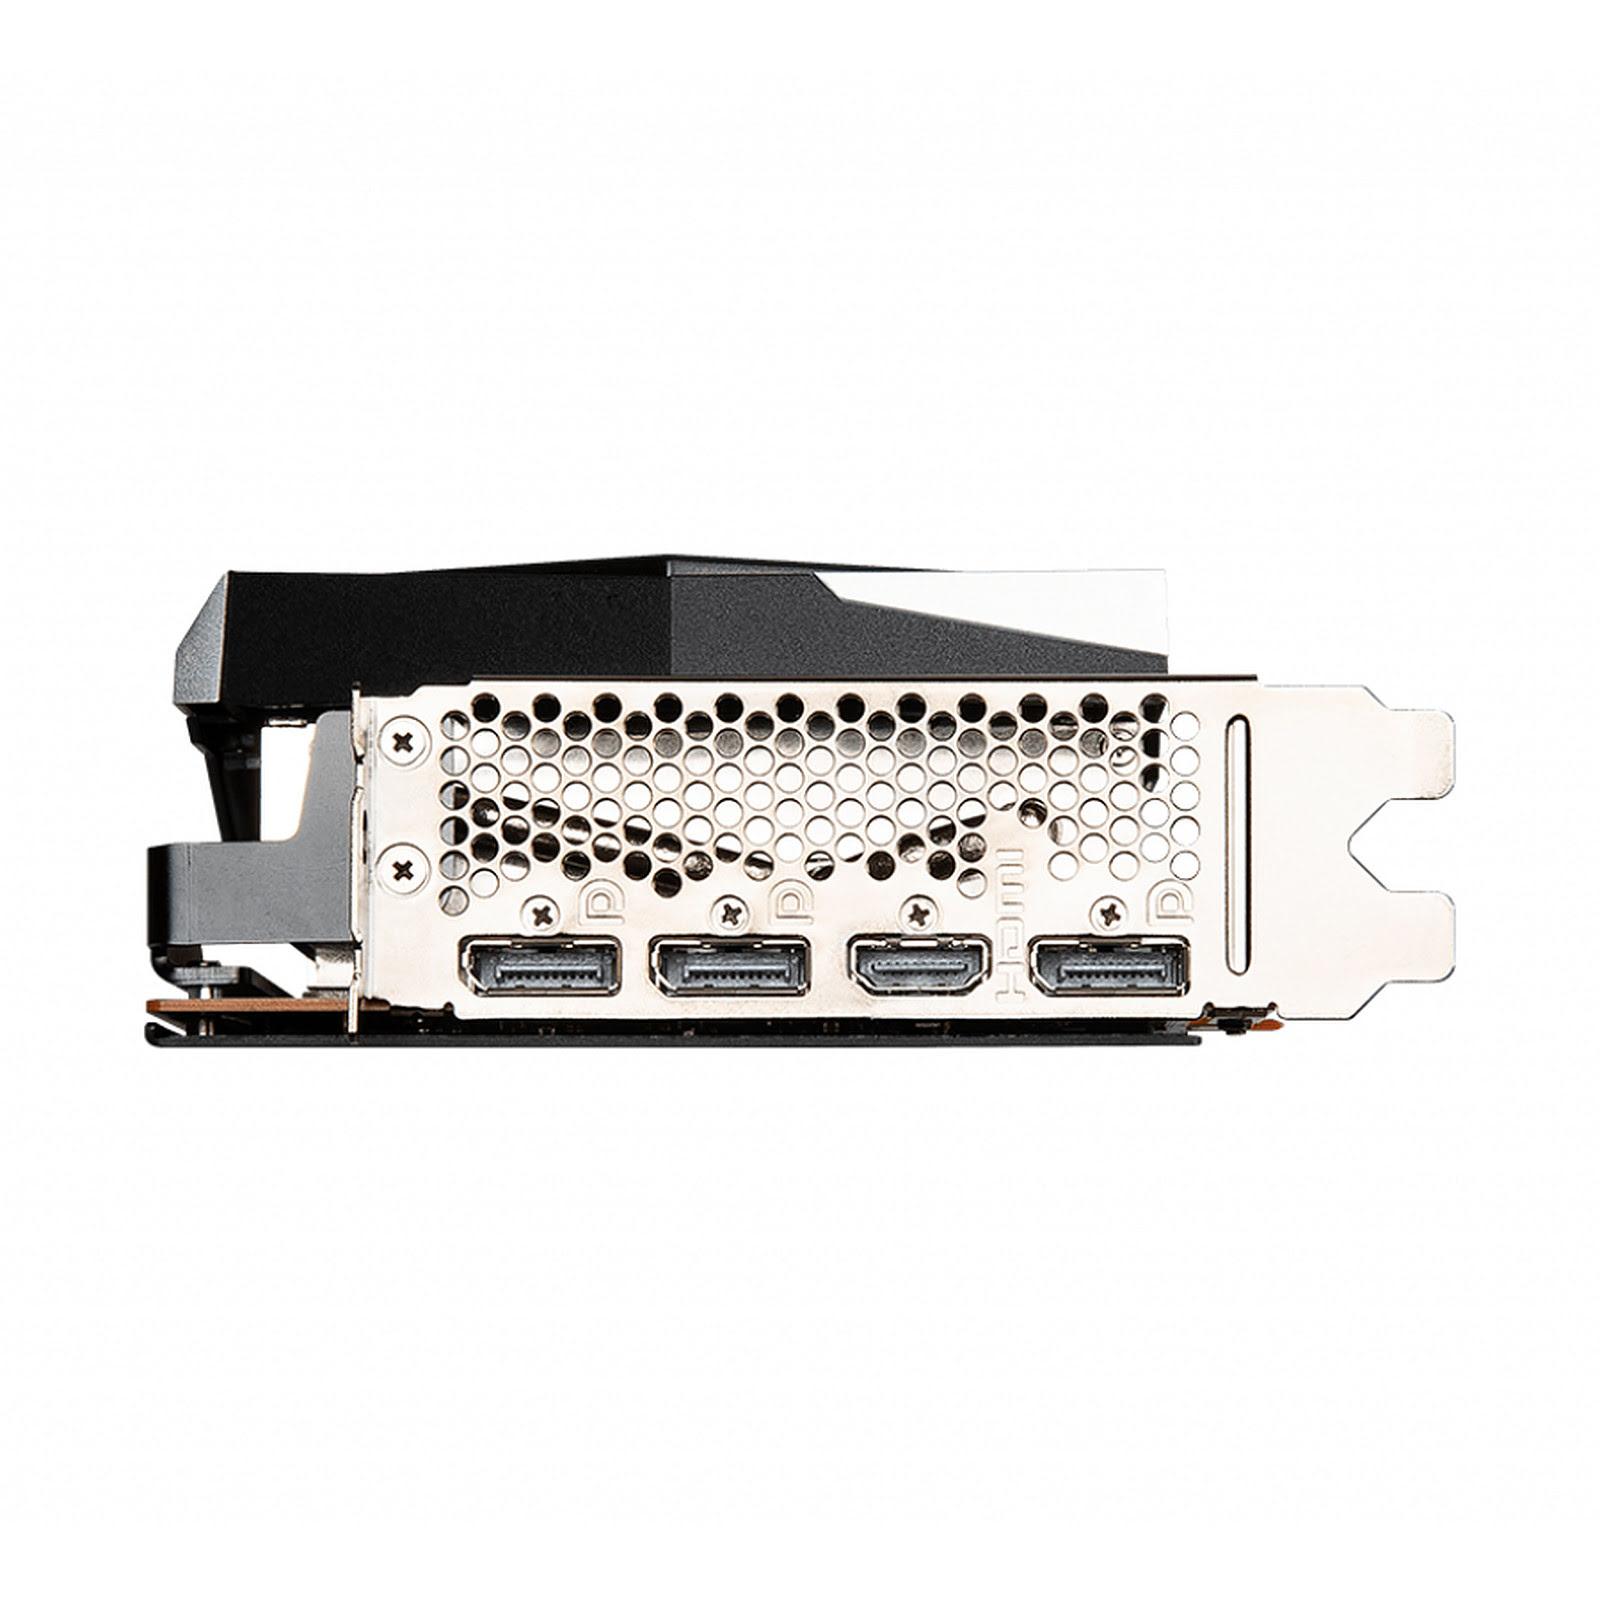 MSI RX 6700 XT GAMING X 12G 12Go - Carte graphique MSI - 1